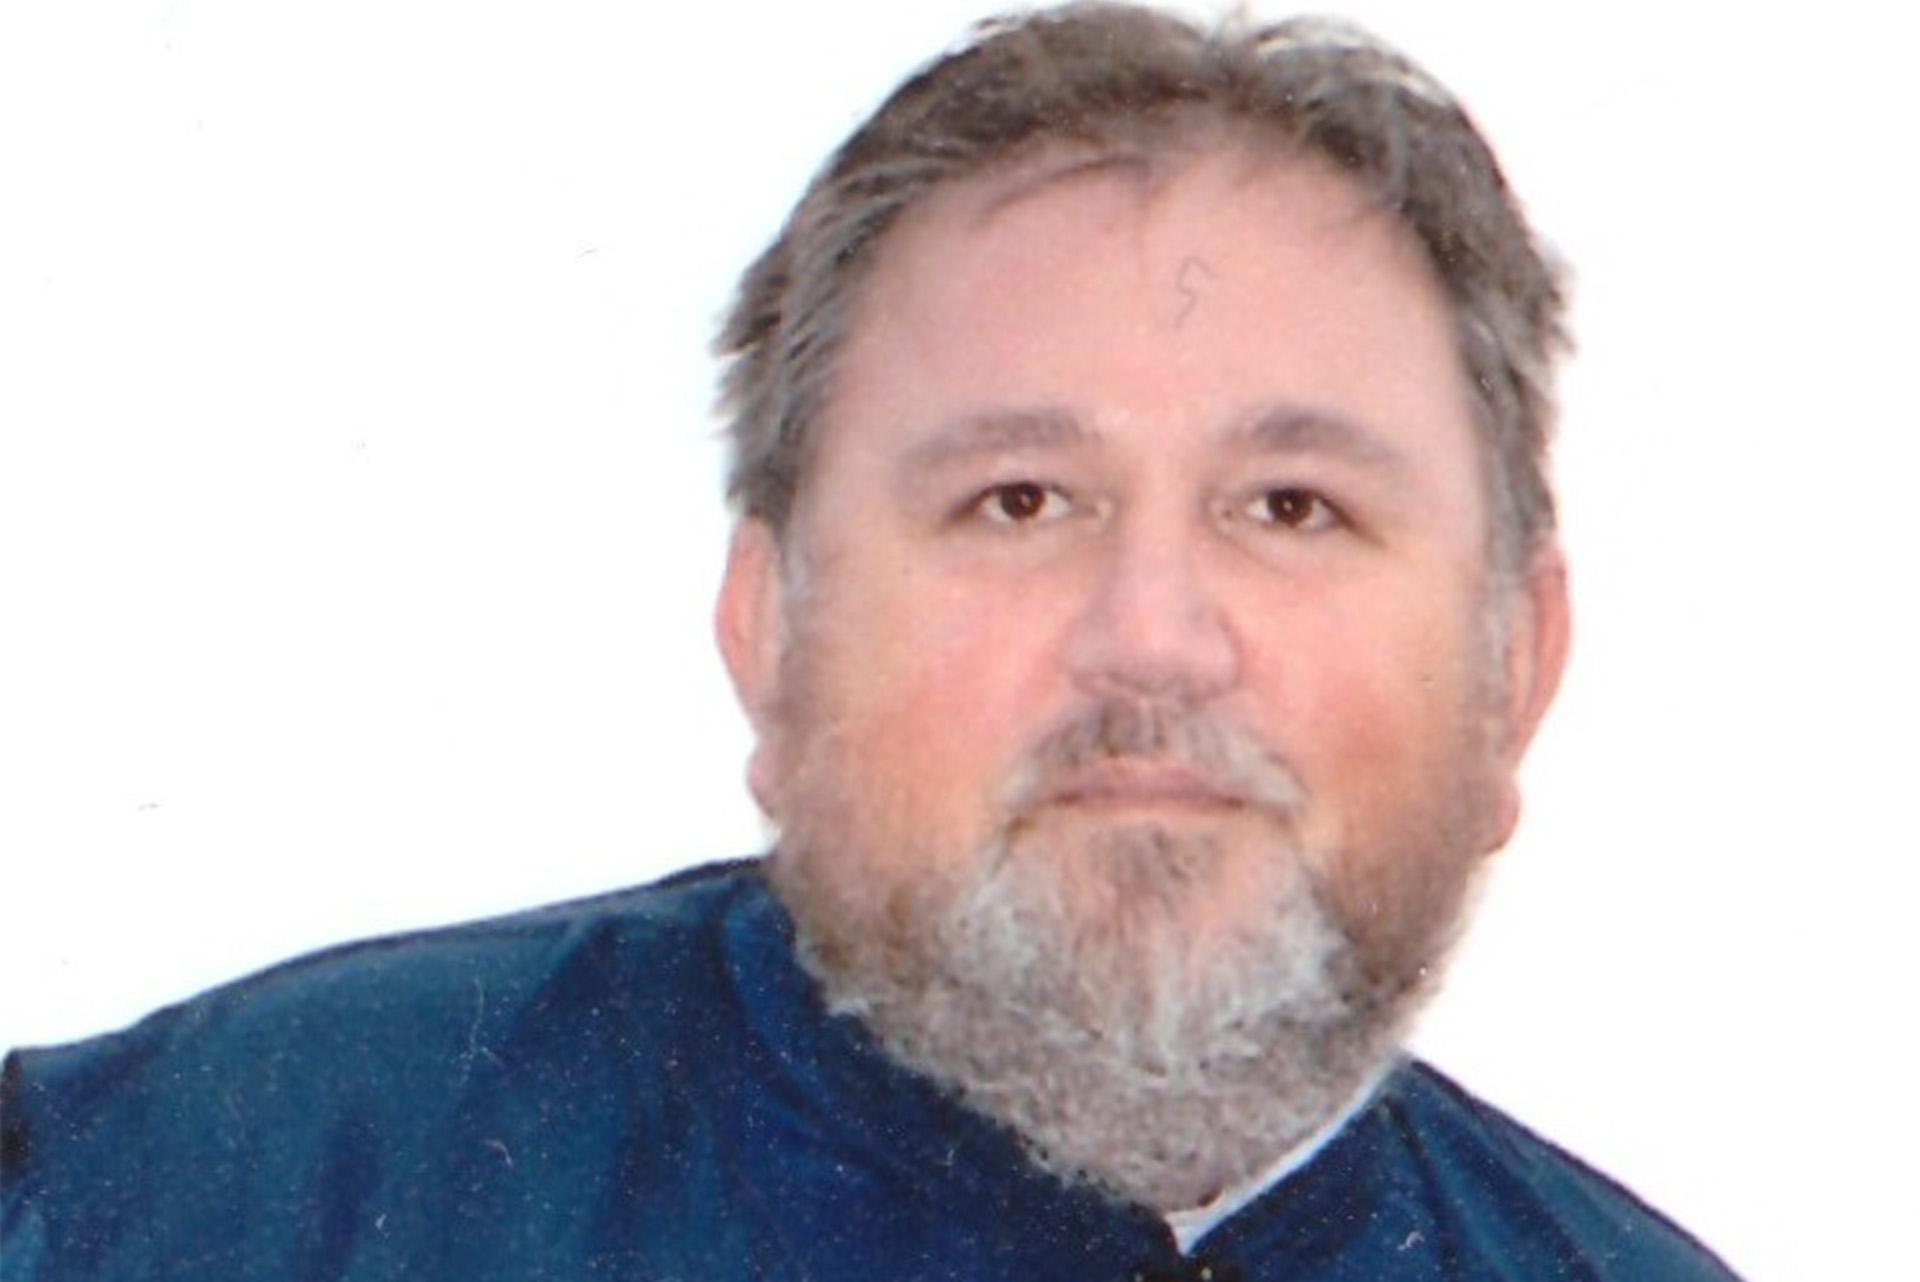 https://brankoradicevic.org.rs/wp-content/uploads/2019/03/Jerej-Branislav-Miskovic.jpg